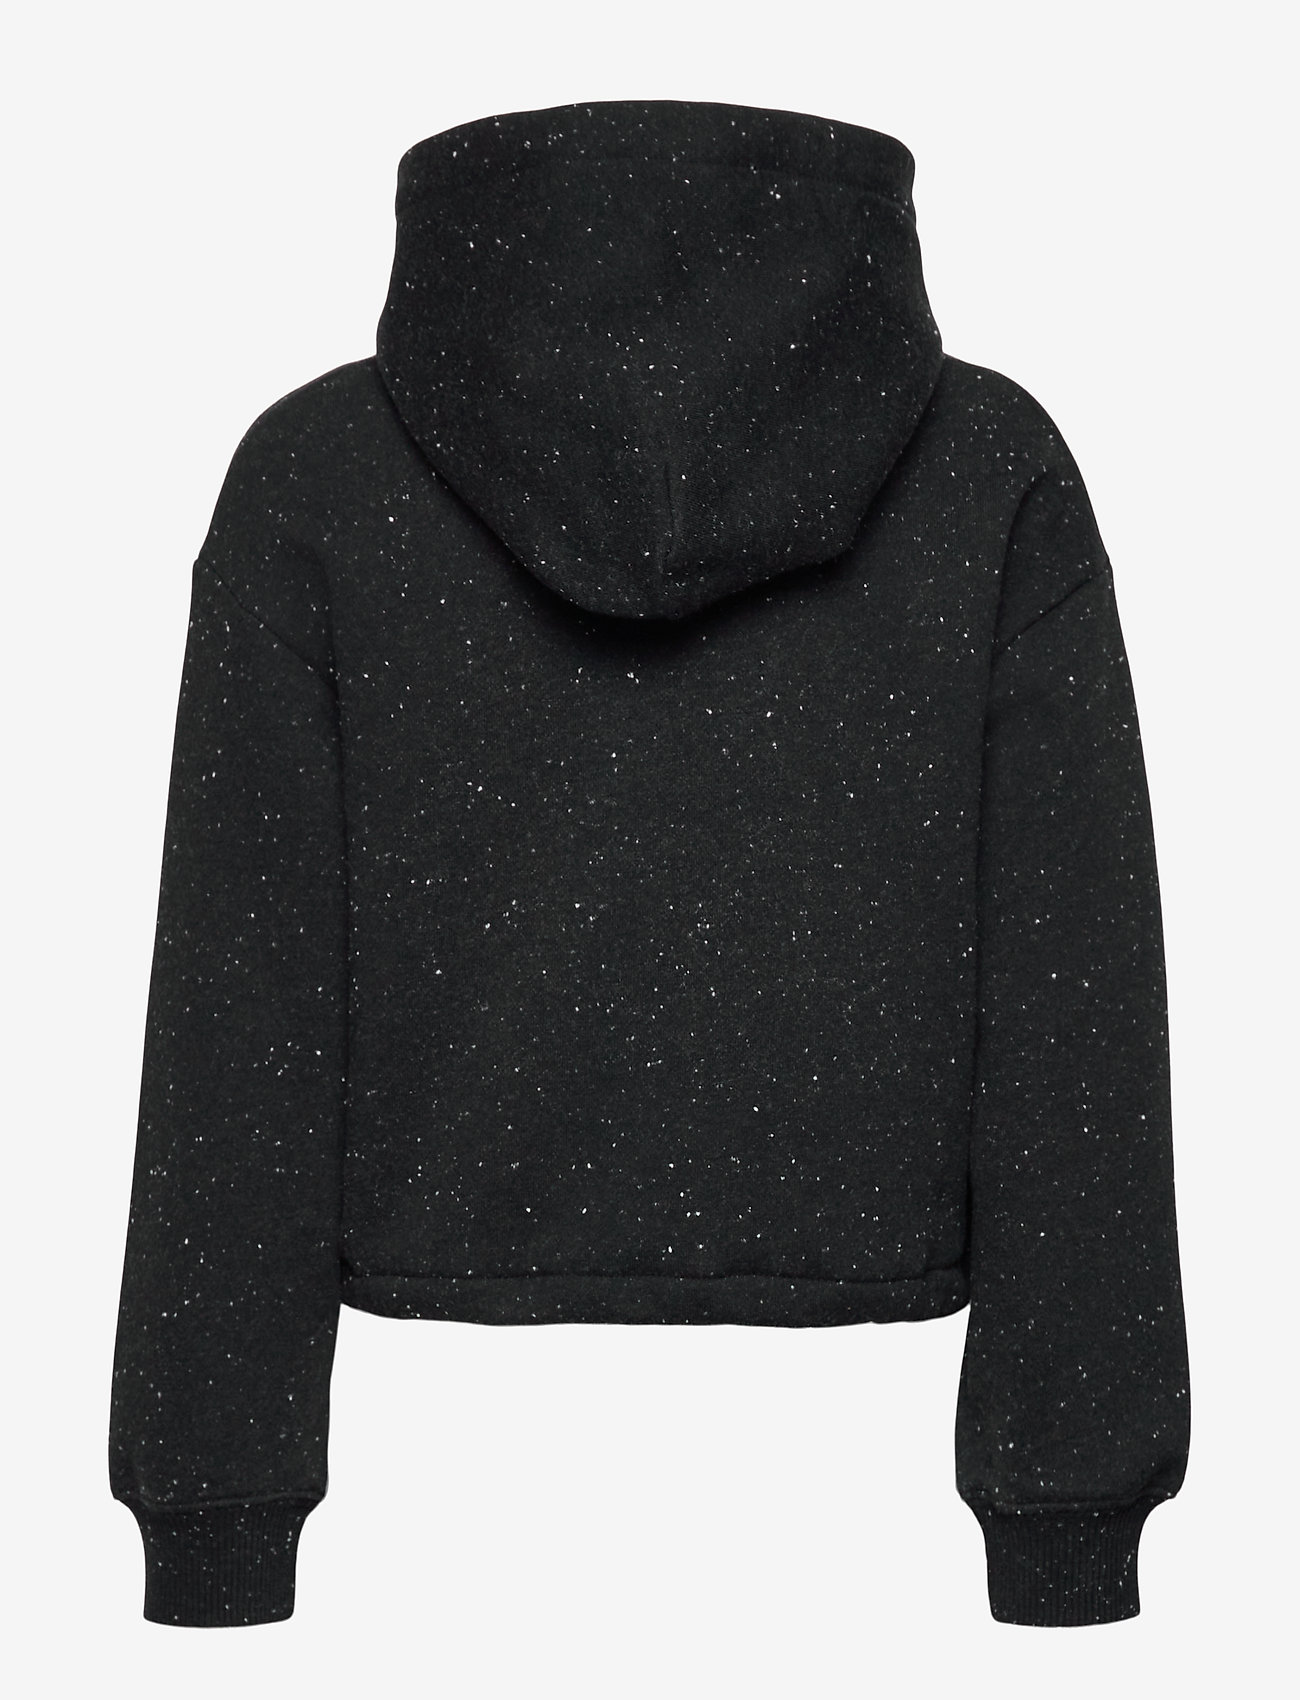 Calvin Klein - OVERLAPPING MONOGRAM BOXY HOODIE - kapuzenpullover - ck black - 1